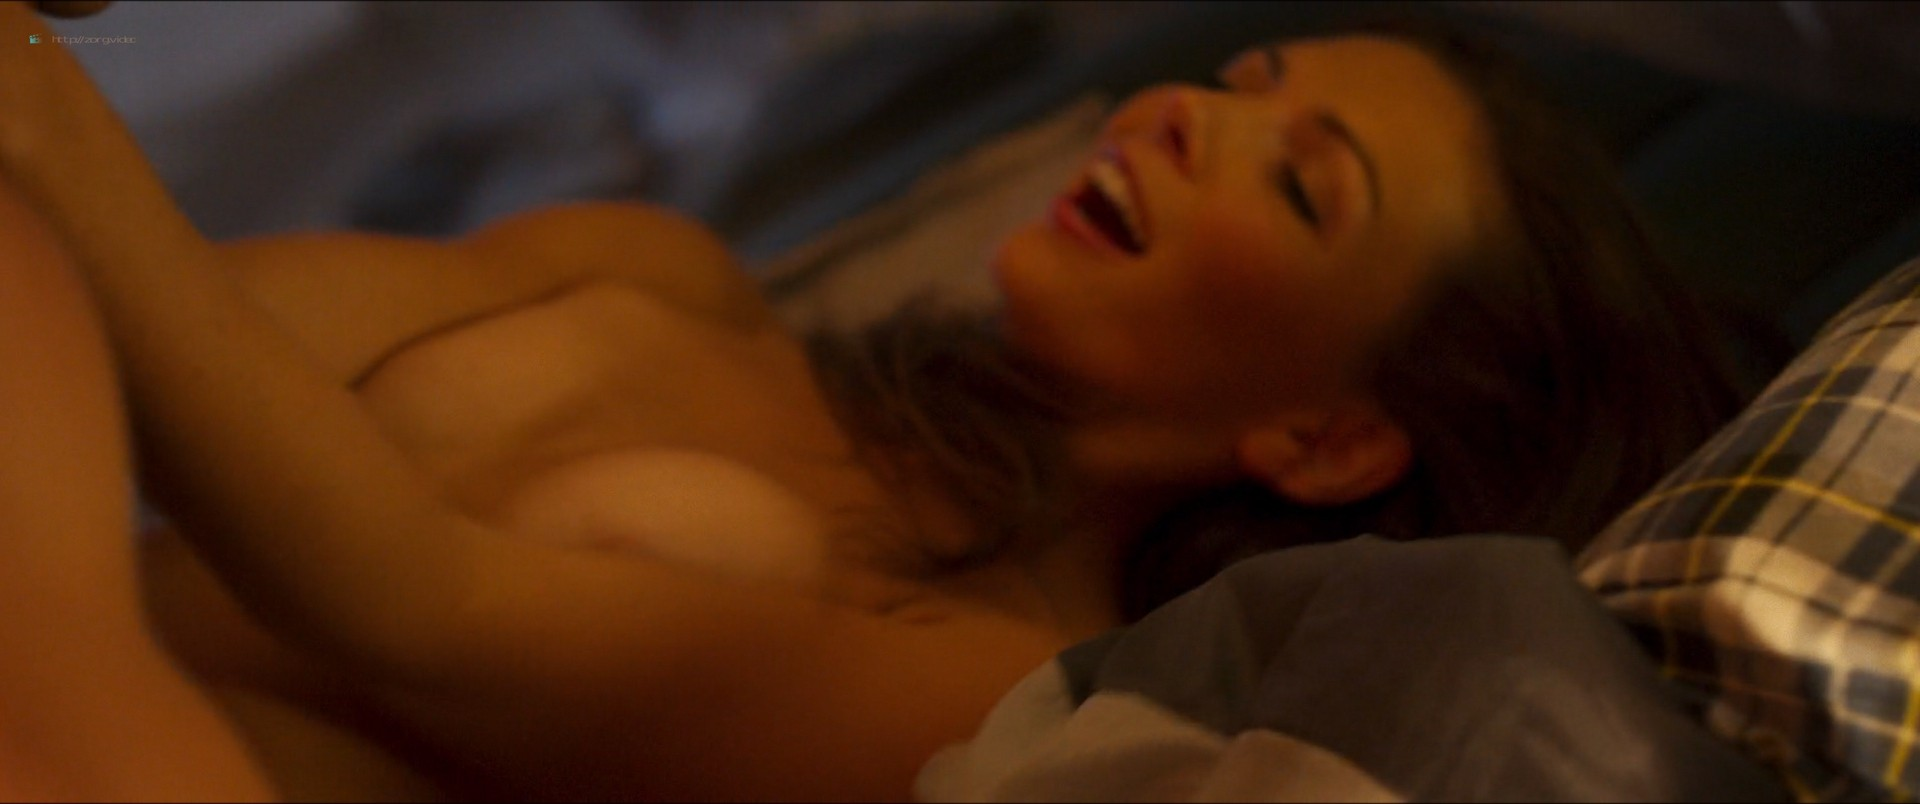 Máire Higgins nude hot sex Lauren Ashlyn O'Brien sexy - Hoax (2019) HD 1080p Web (4)